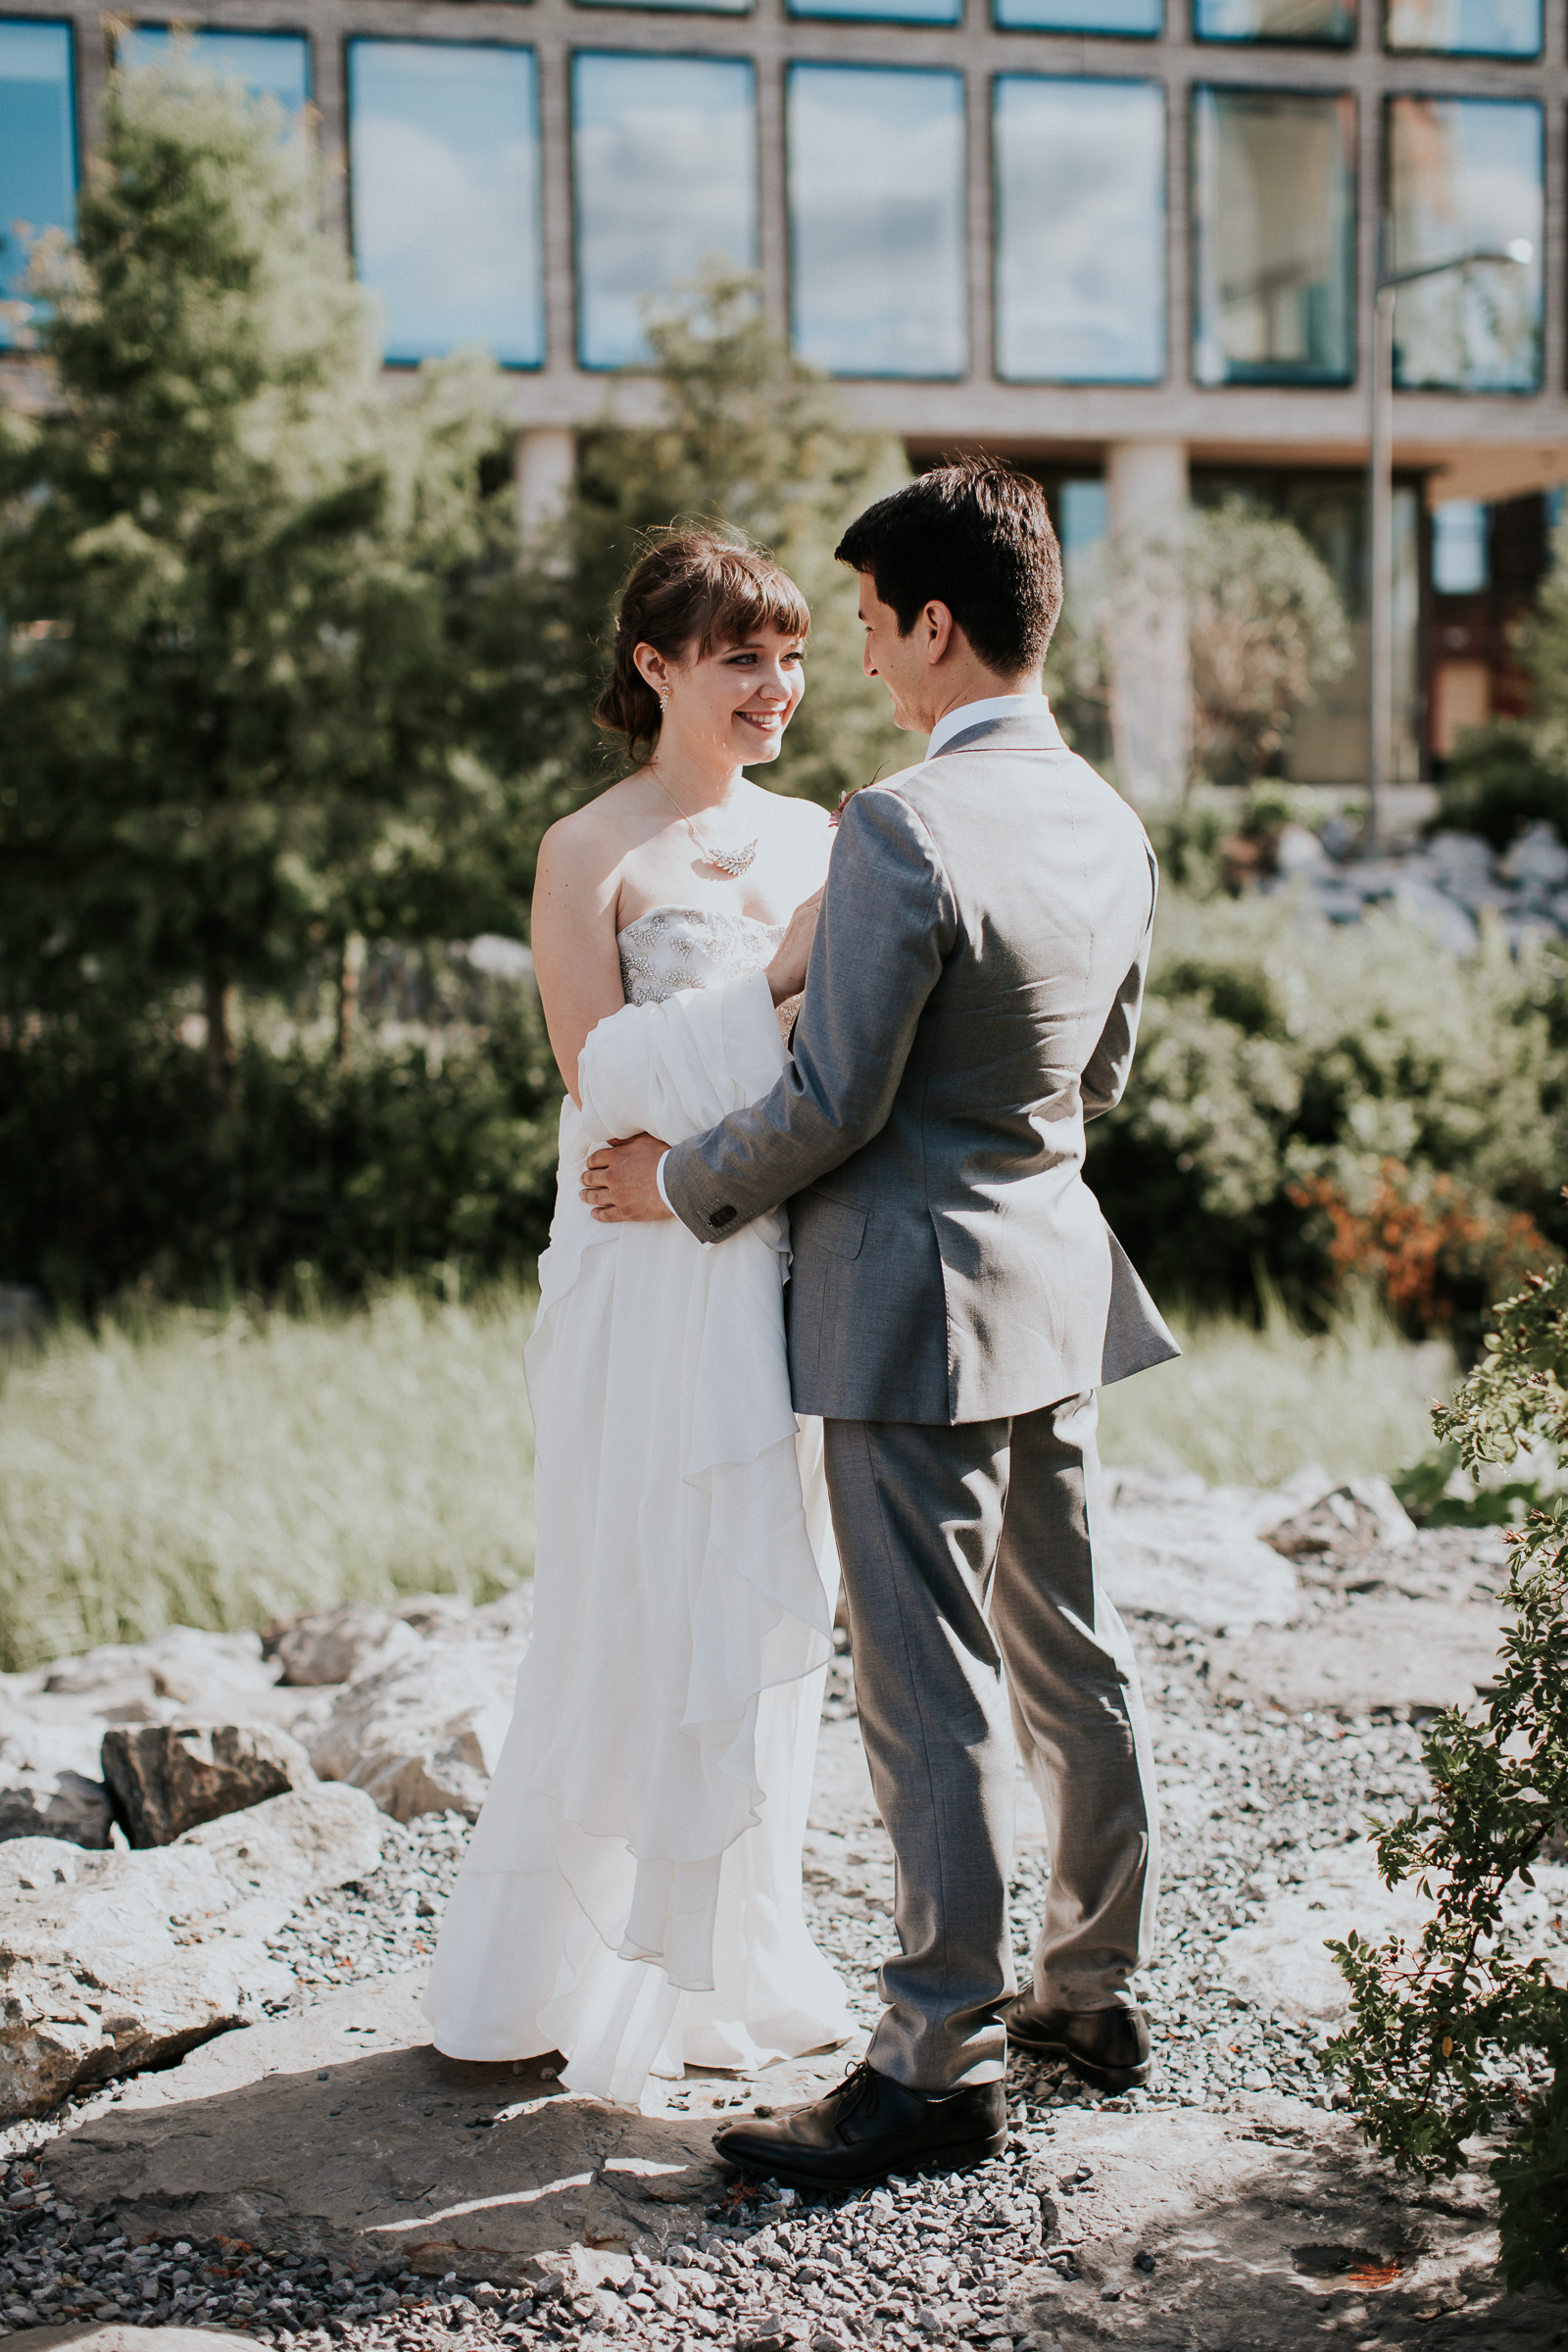 Dinosaur-Inspired-Brooklyn-Wedding-26-Bridge-New-York-Documentary-Wedding-Photographer-27.jpg